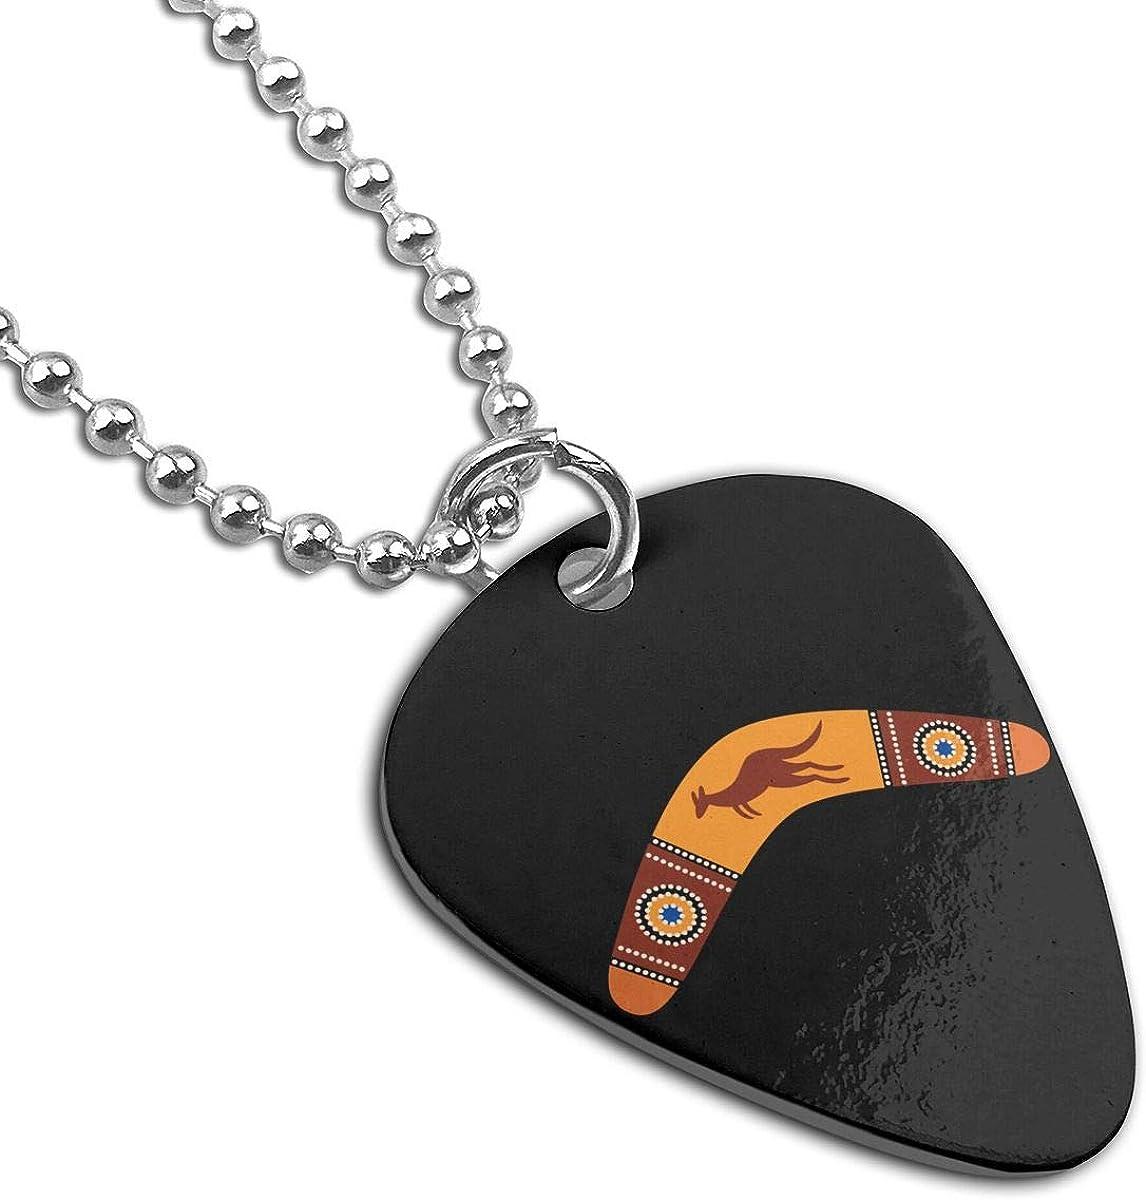 Australian Darts Custom Guitar Pick Pendant Necklace Keychain